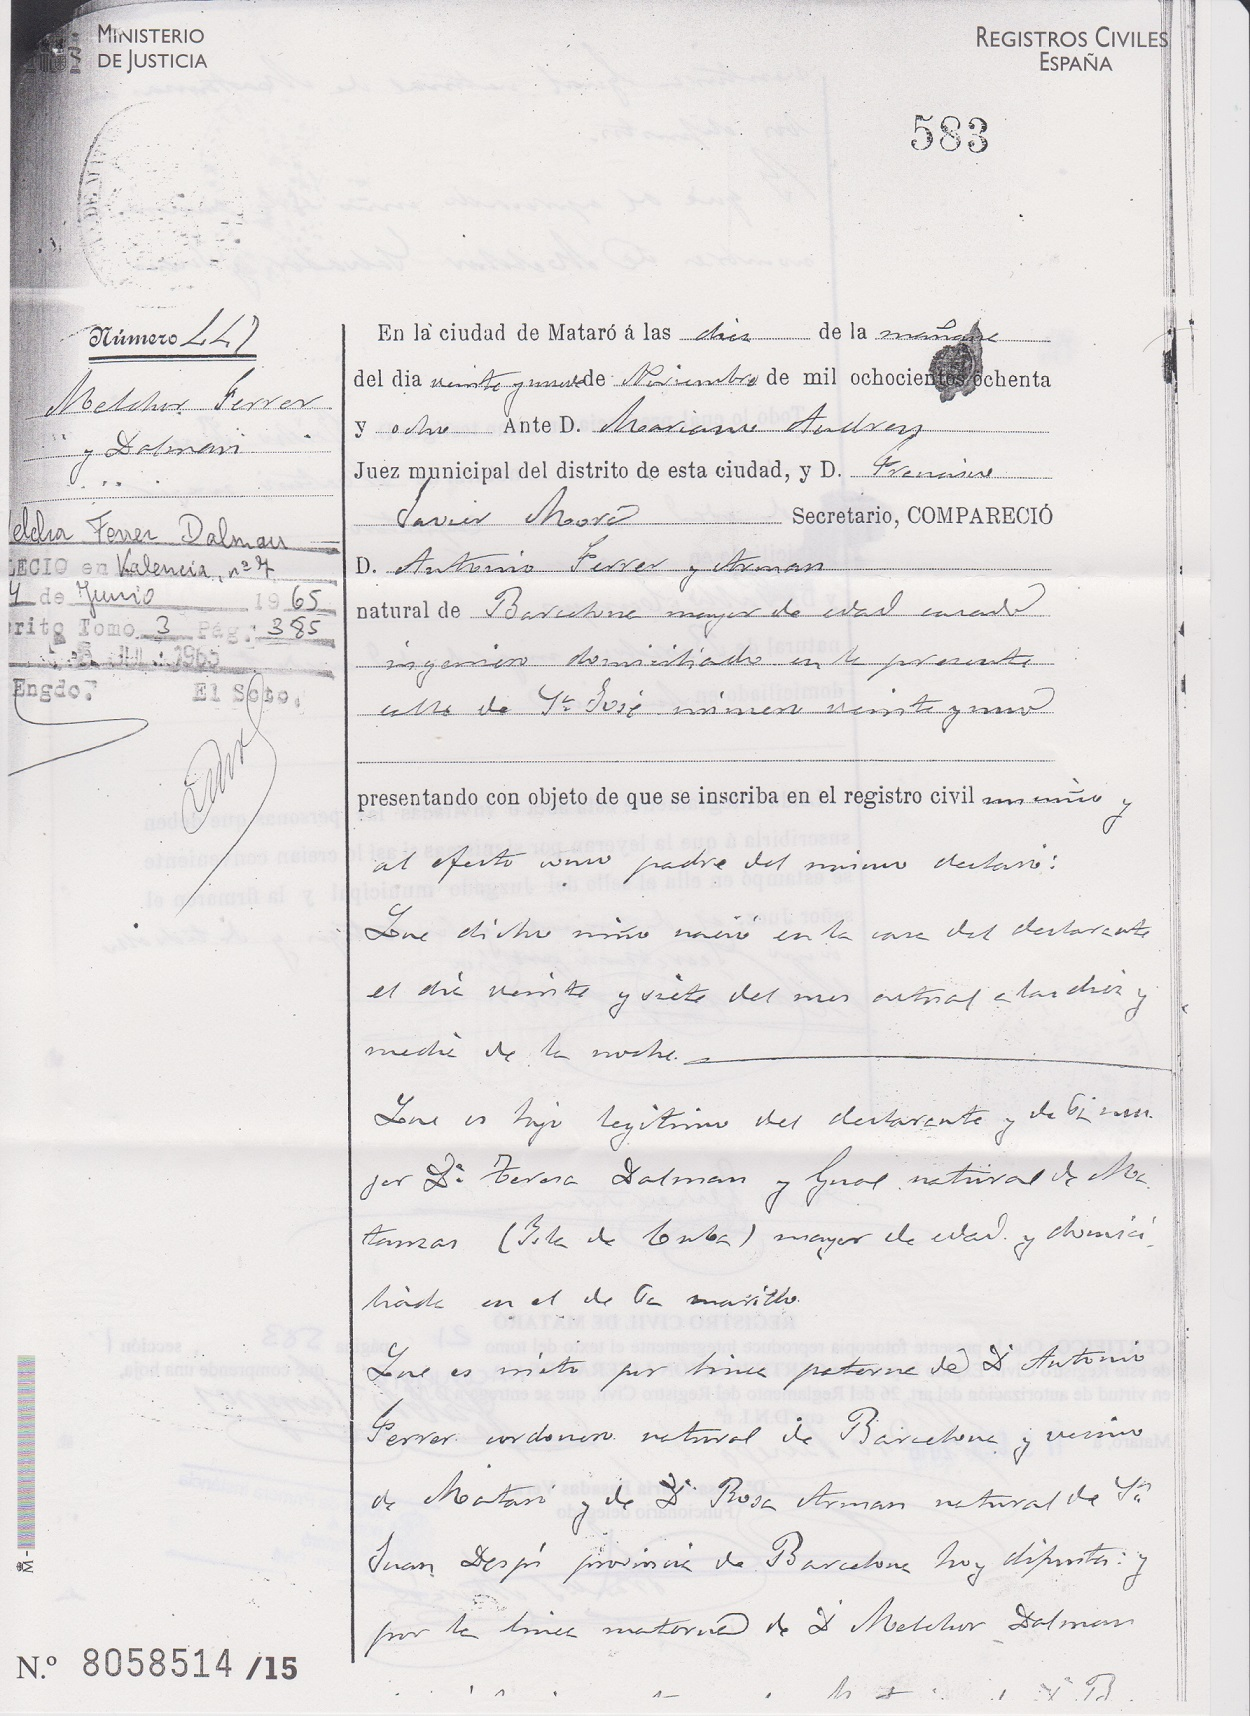 Melchor Ferrer Dalmau - Wikipedia